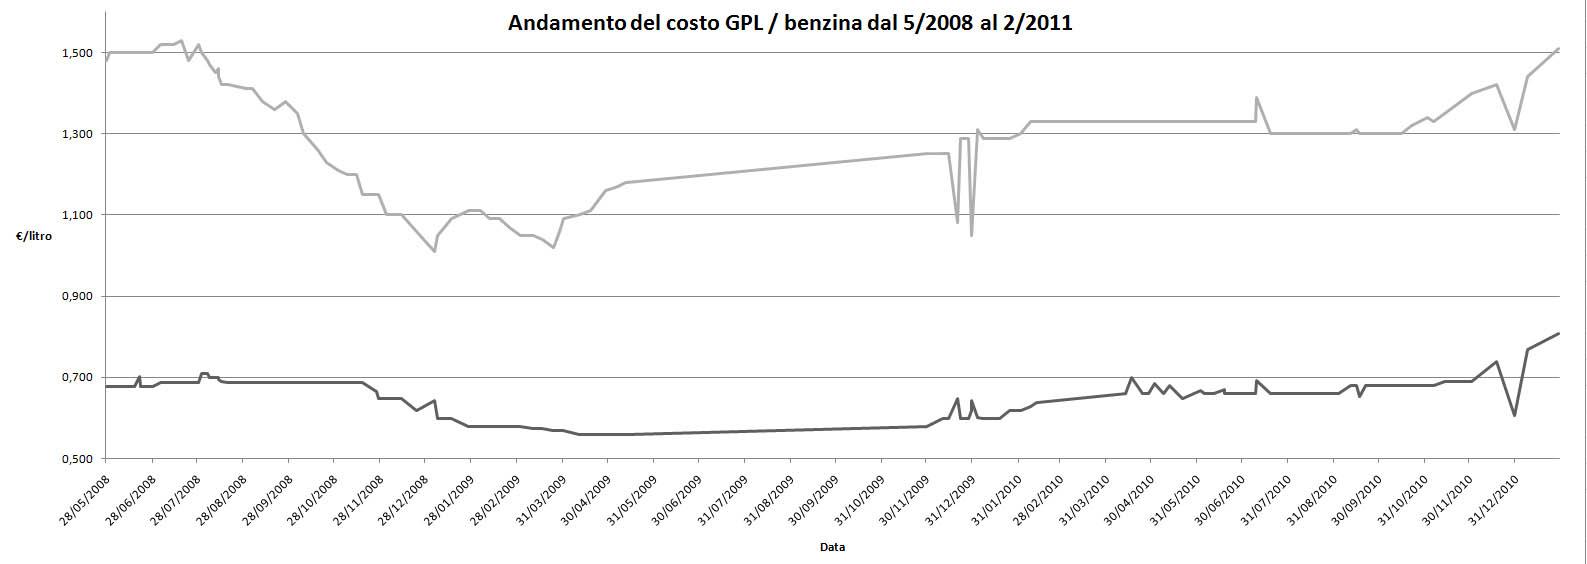 Andamento costo benzina 2008-2011